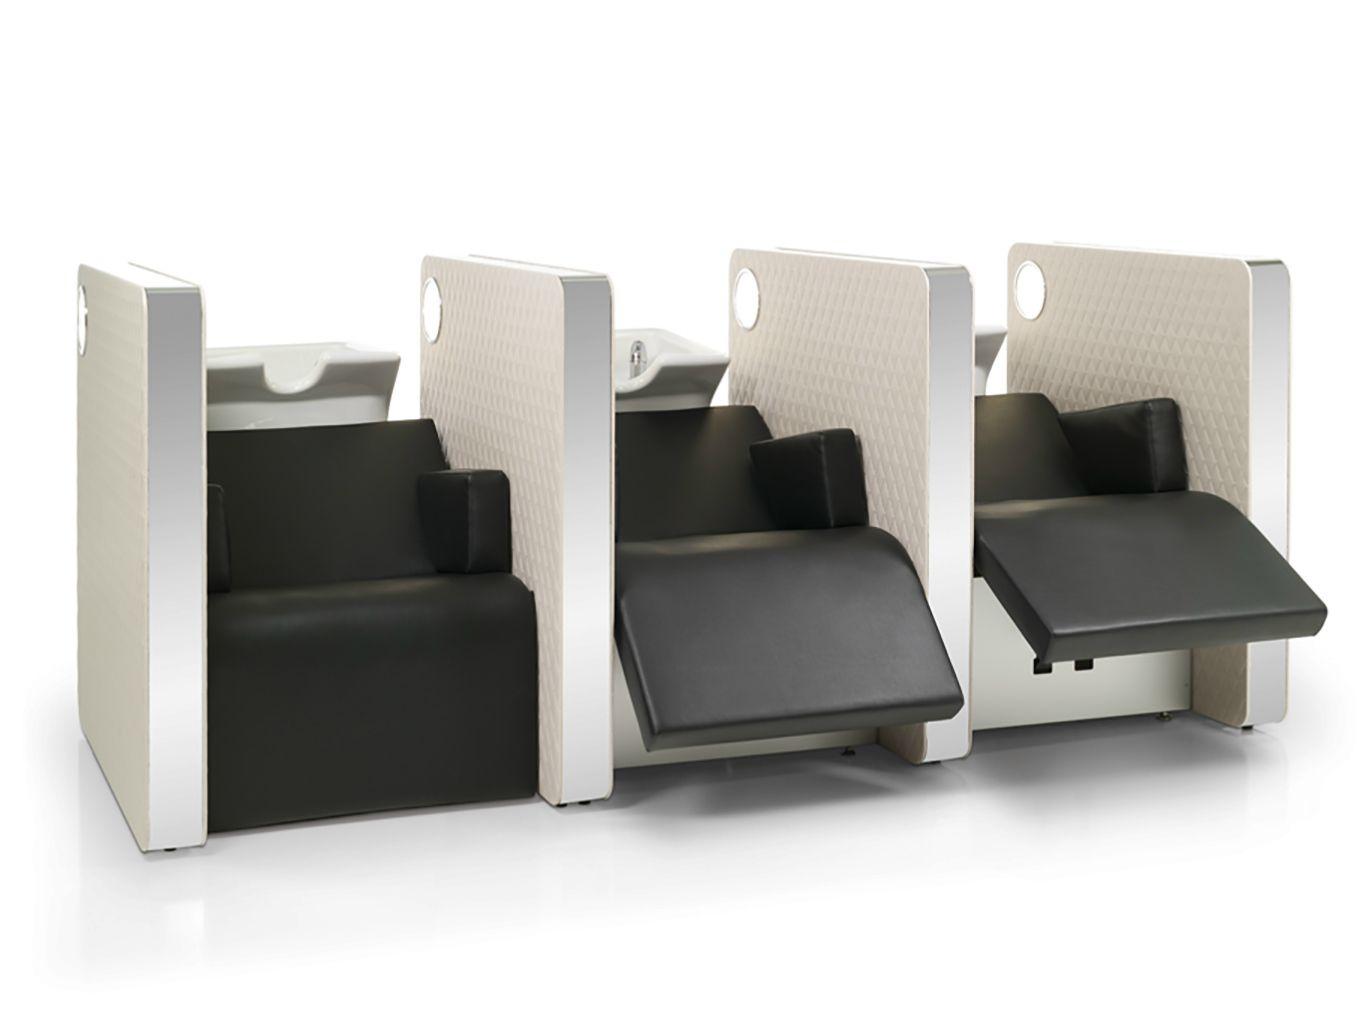 Lavatesta per parrucchieri vip lounge by gamma bross for Gamma arredamenti parrucchieri